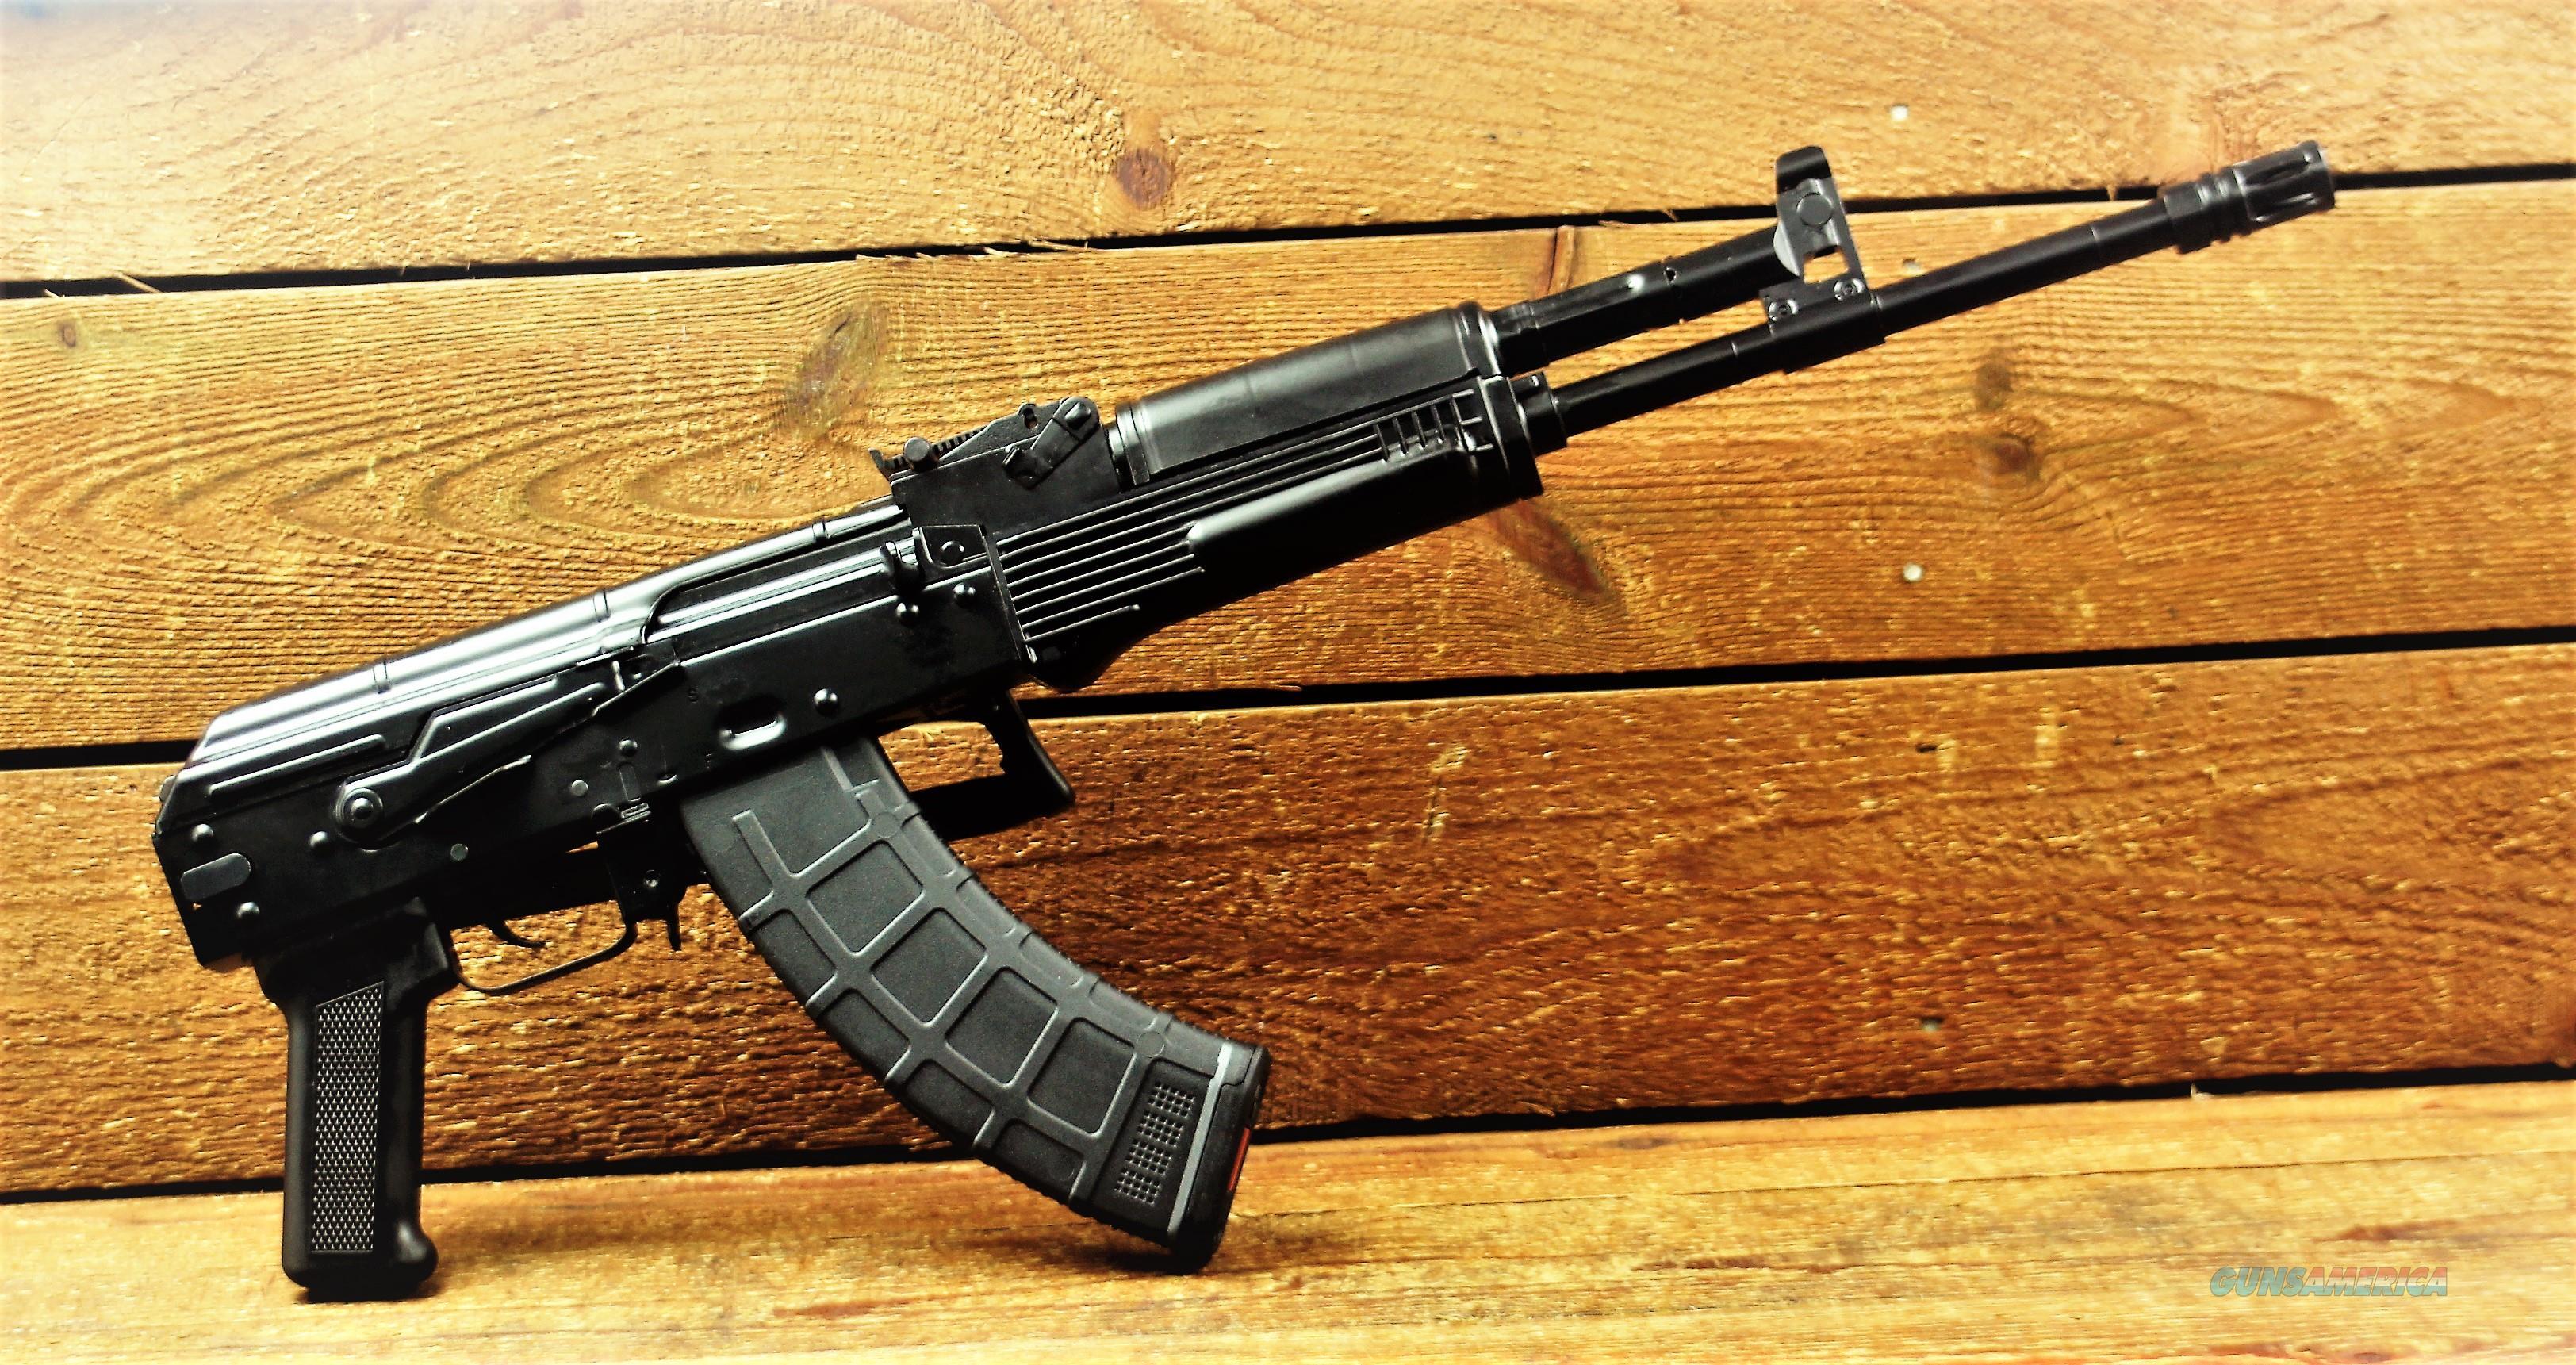 DDI US KALASHNIKOV 7 62X39 AK AK-47 AK47 TRIANGLE FOLDING STOCK 1-30 MG  Military grade furniture DDI474150MBPTF FLASH HIDER EASY PAY $90